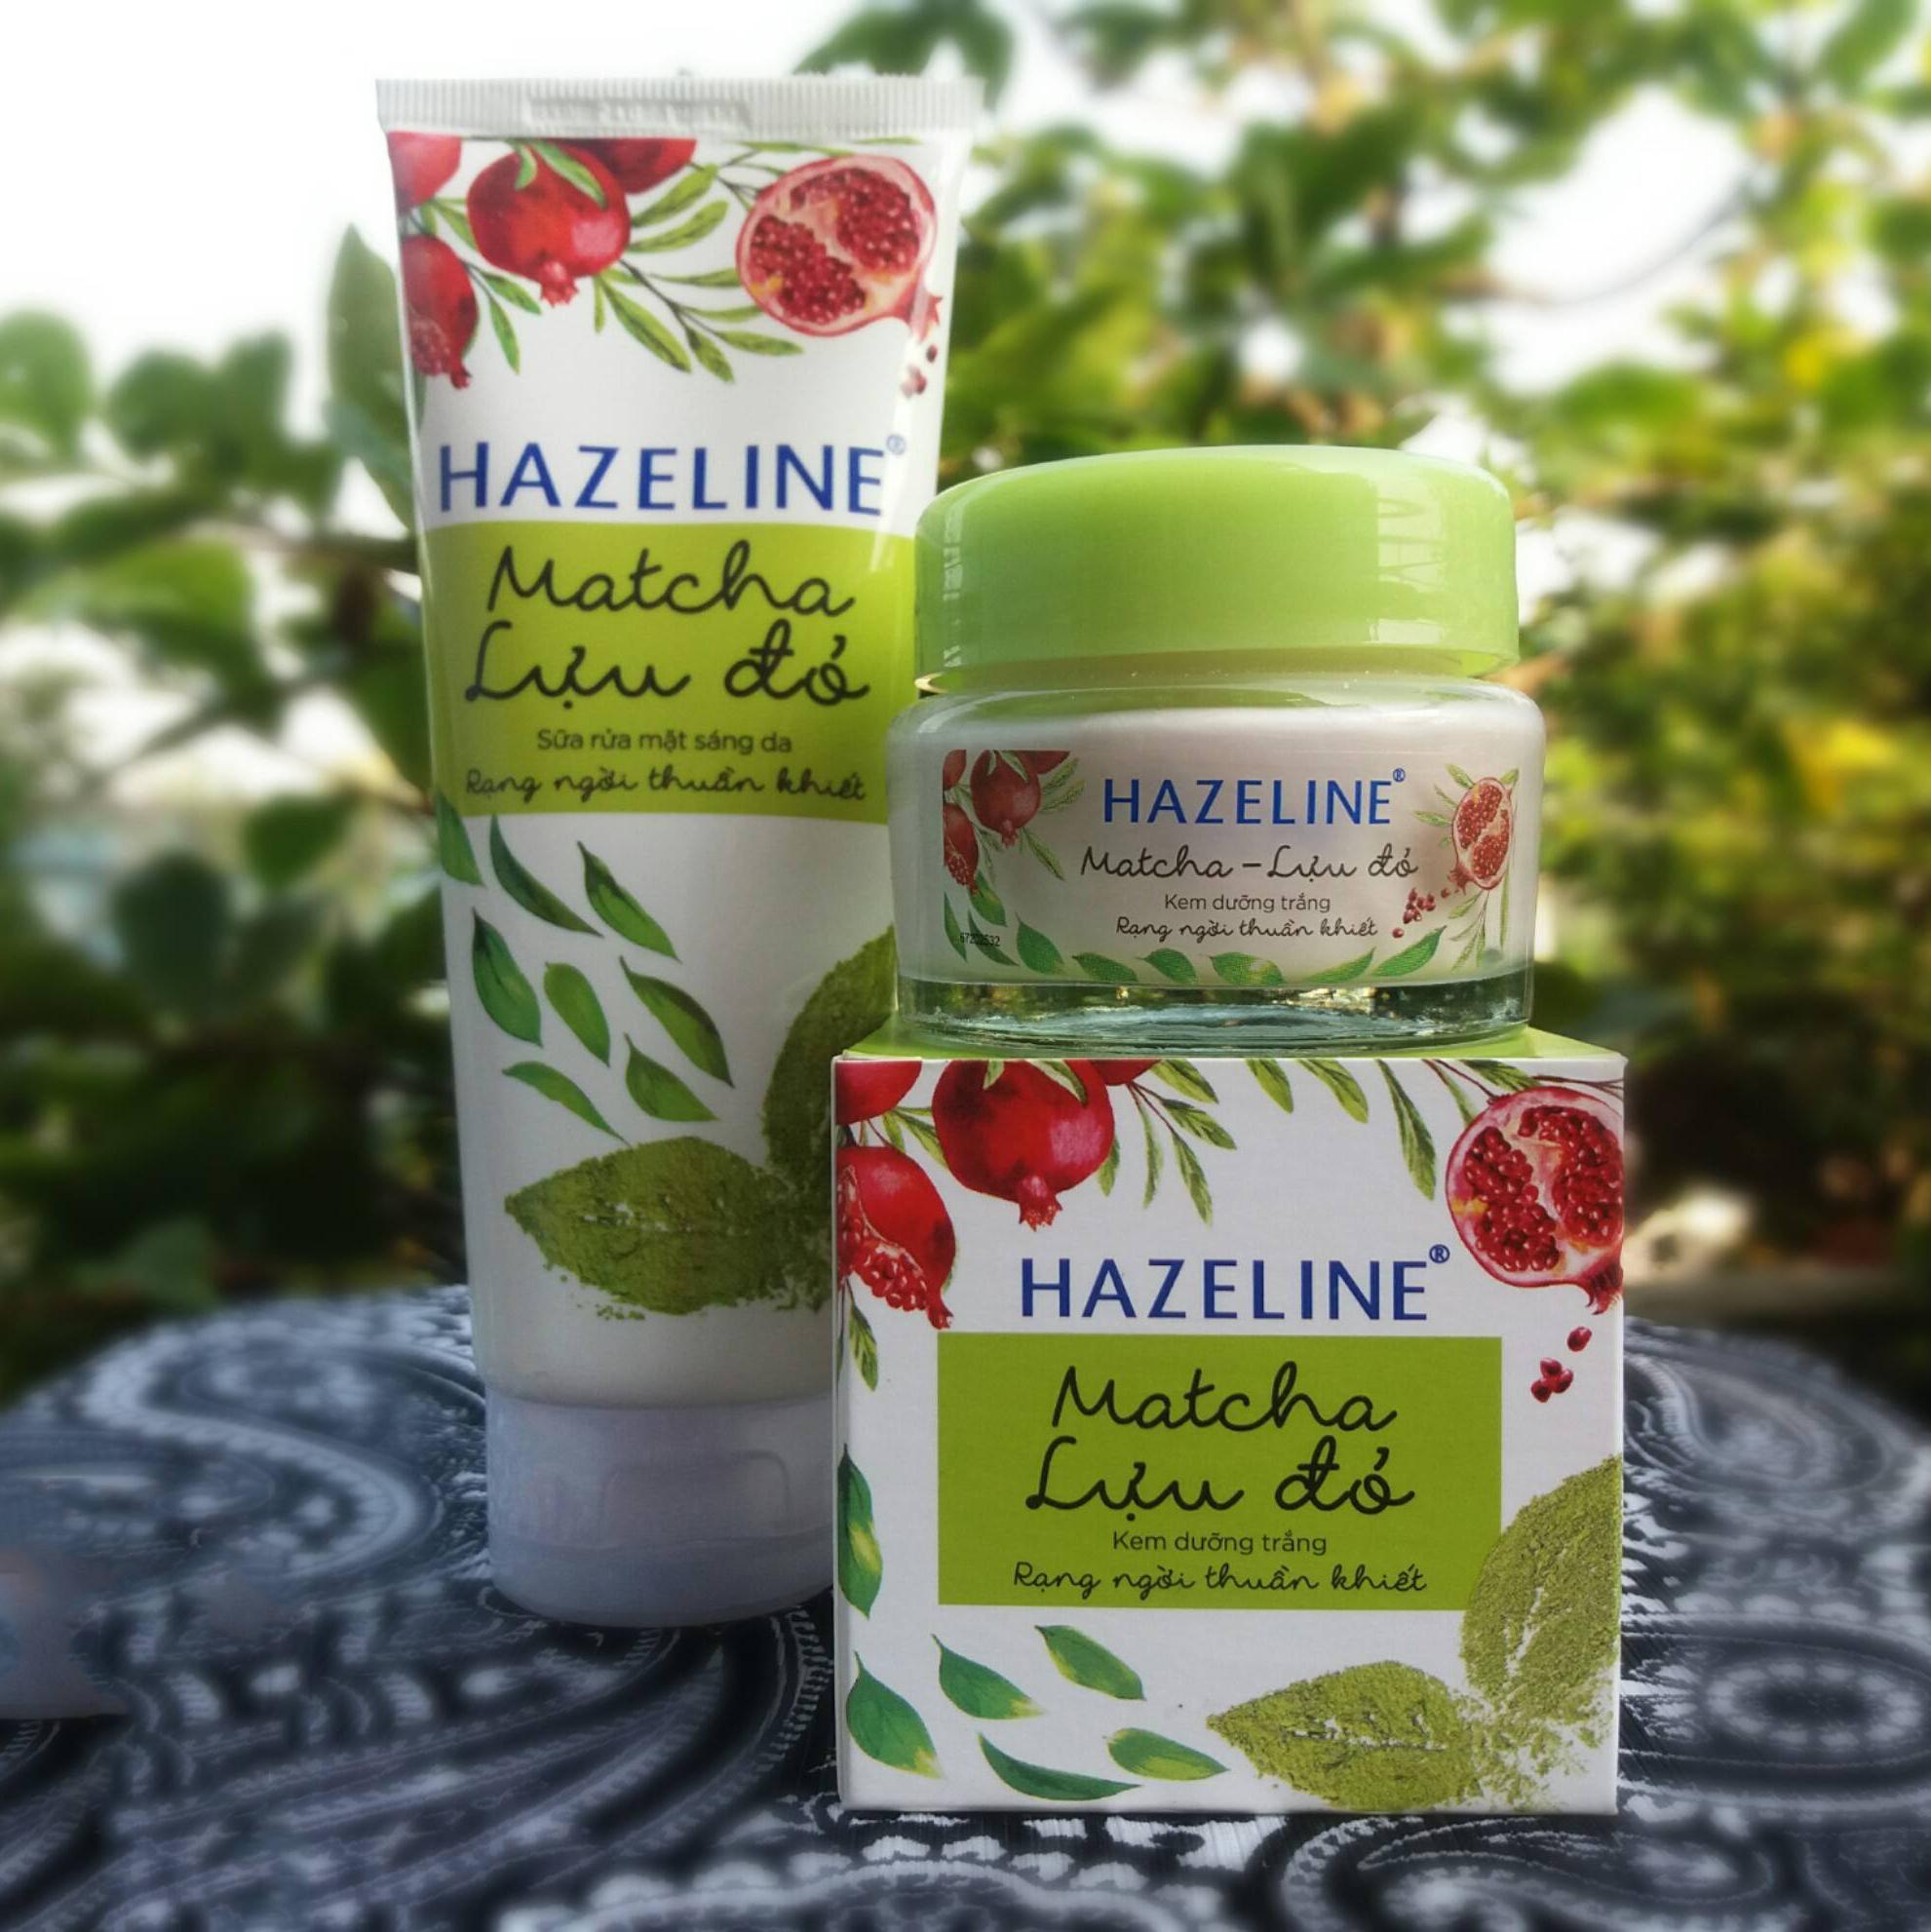 Bộ kem dưỡng trắng Hazeline